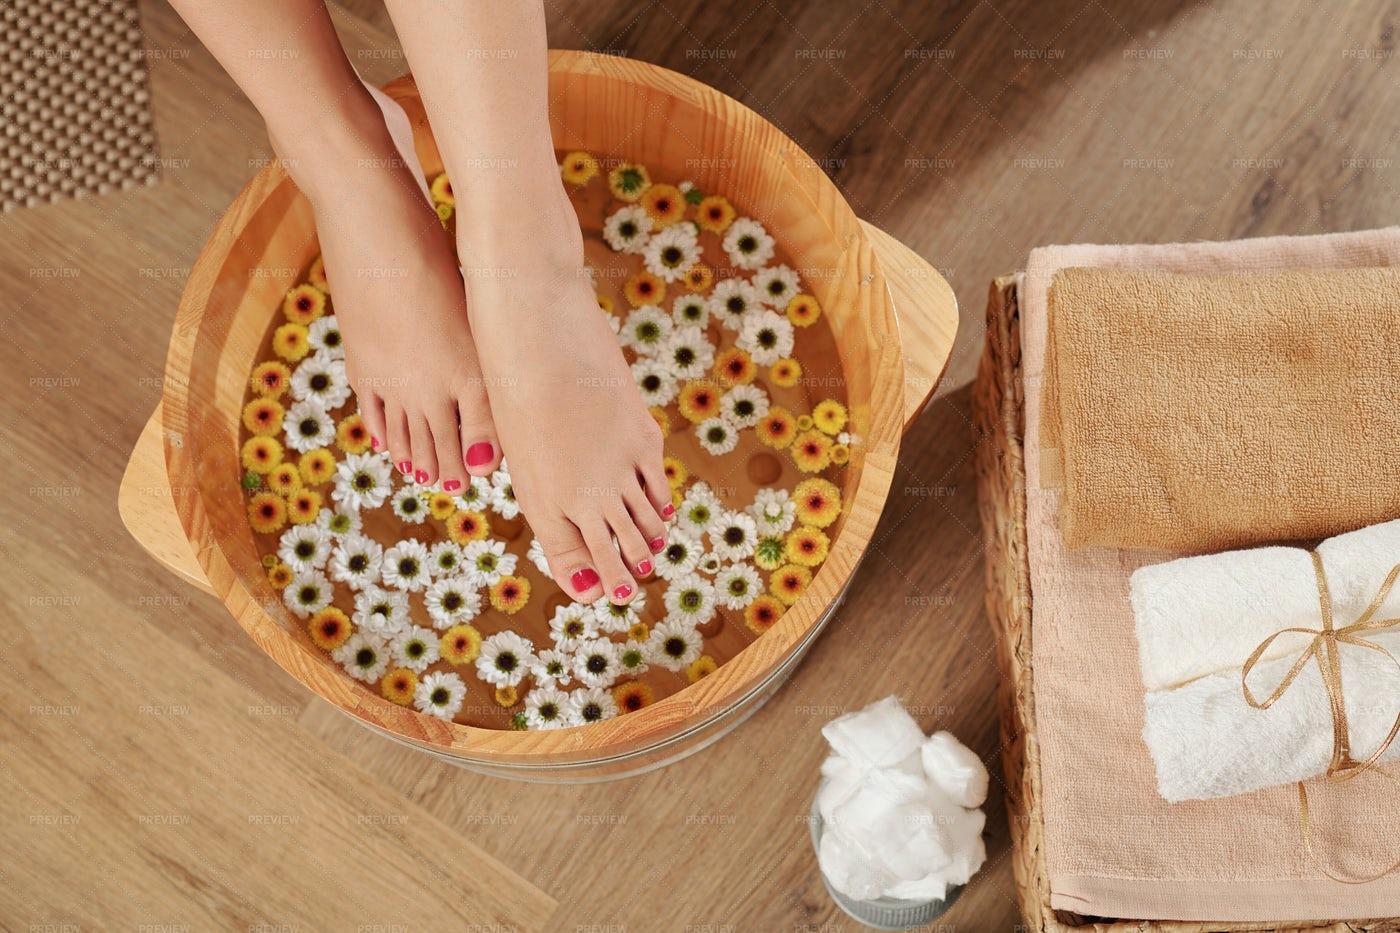 Woman Putting Feet In Warm Water: Stock Photos